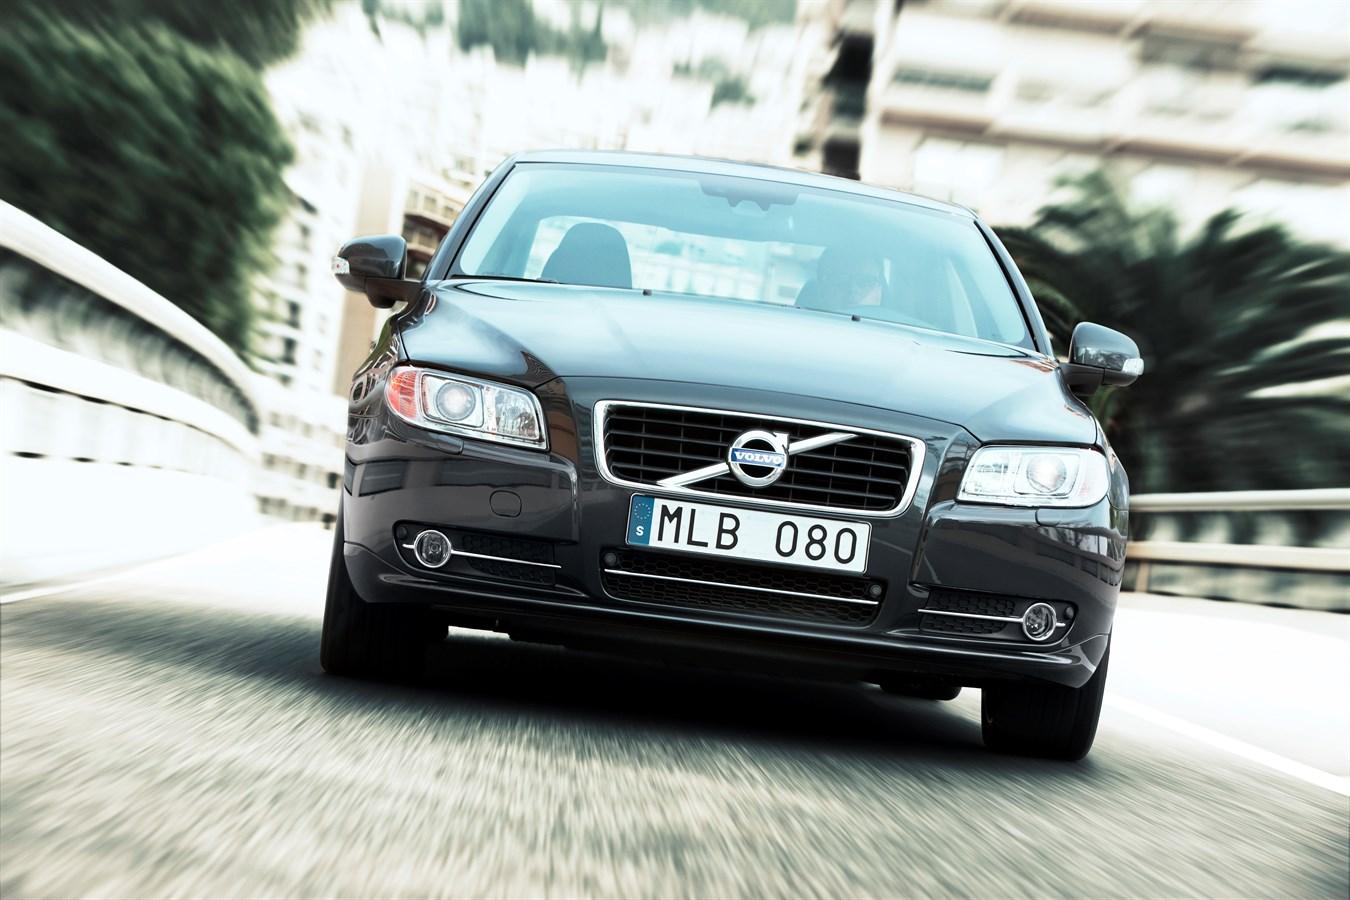 Volvo S80 - model year 2010 - Volvo Cars Global Media Newsroom